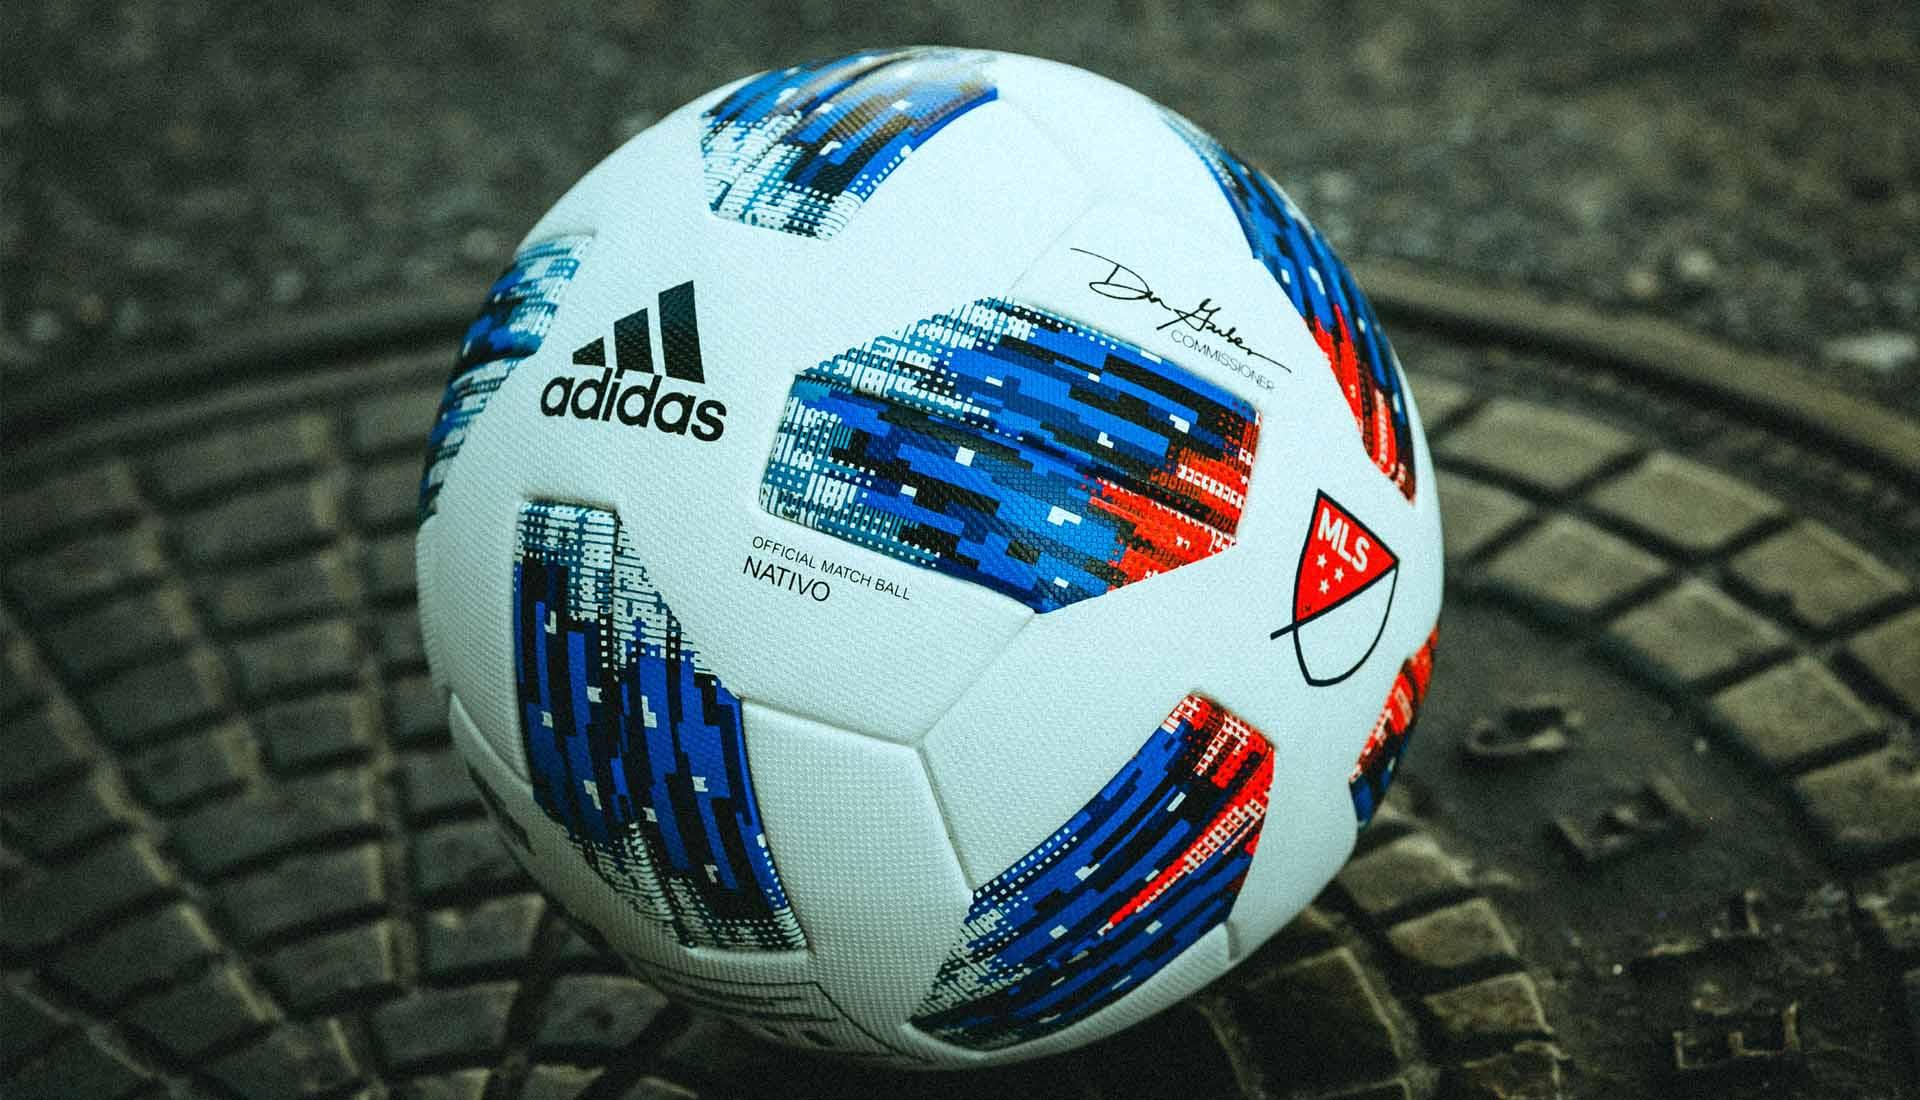 ballon-football-adidas-MLS-Nativo-2018-img3